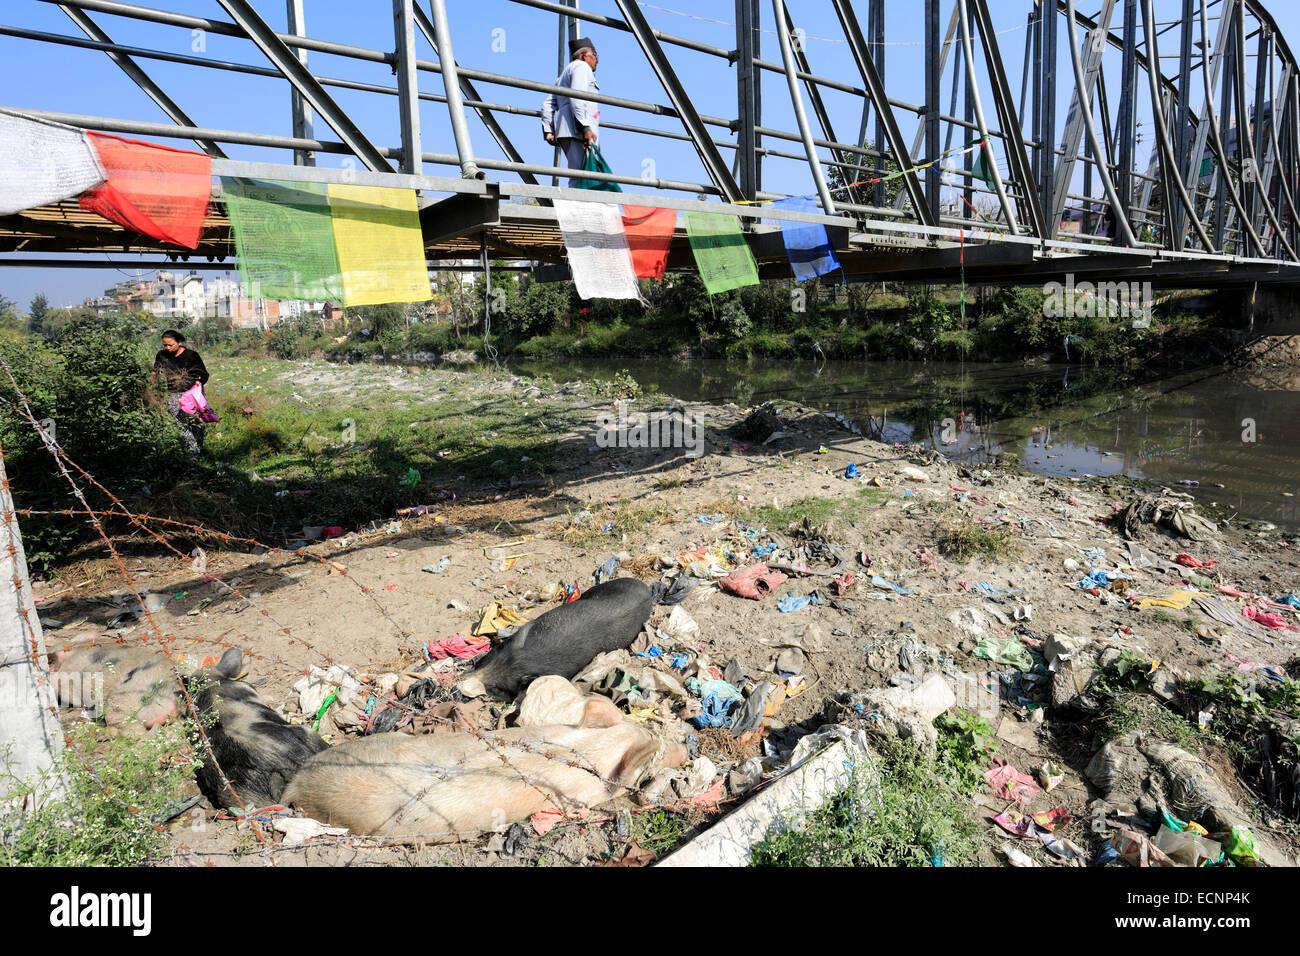 Image of rubbish in the Bishnumati river, Thamel district, Kathmandu city, Nepal, Asia. - Stock Image